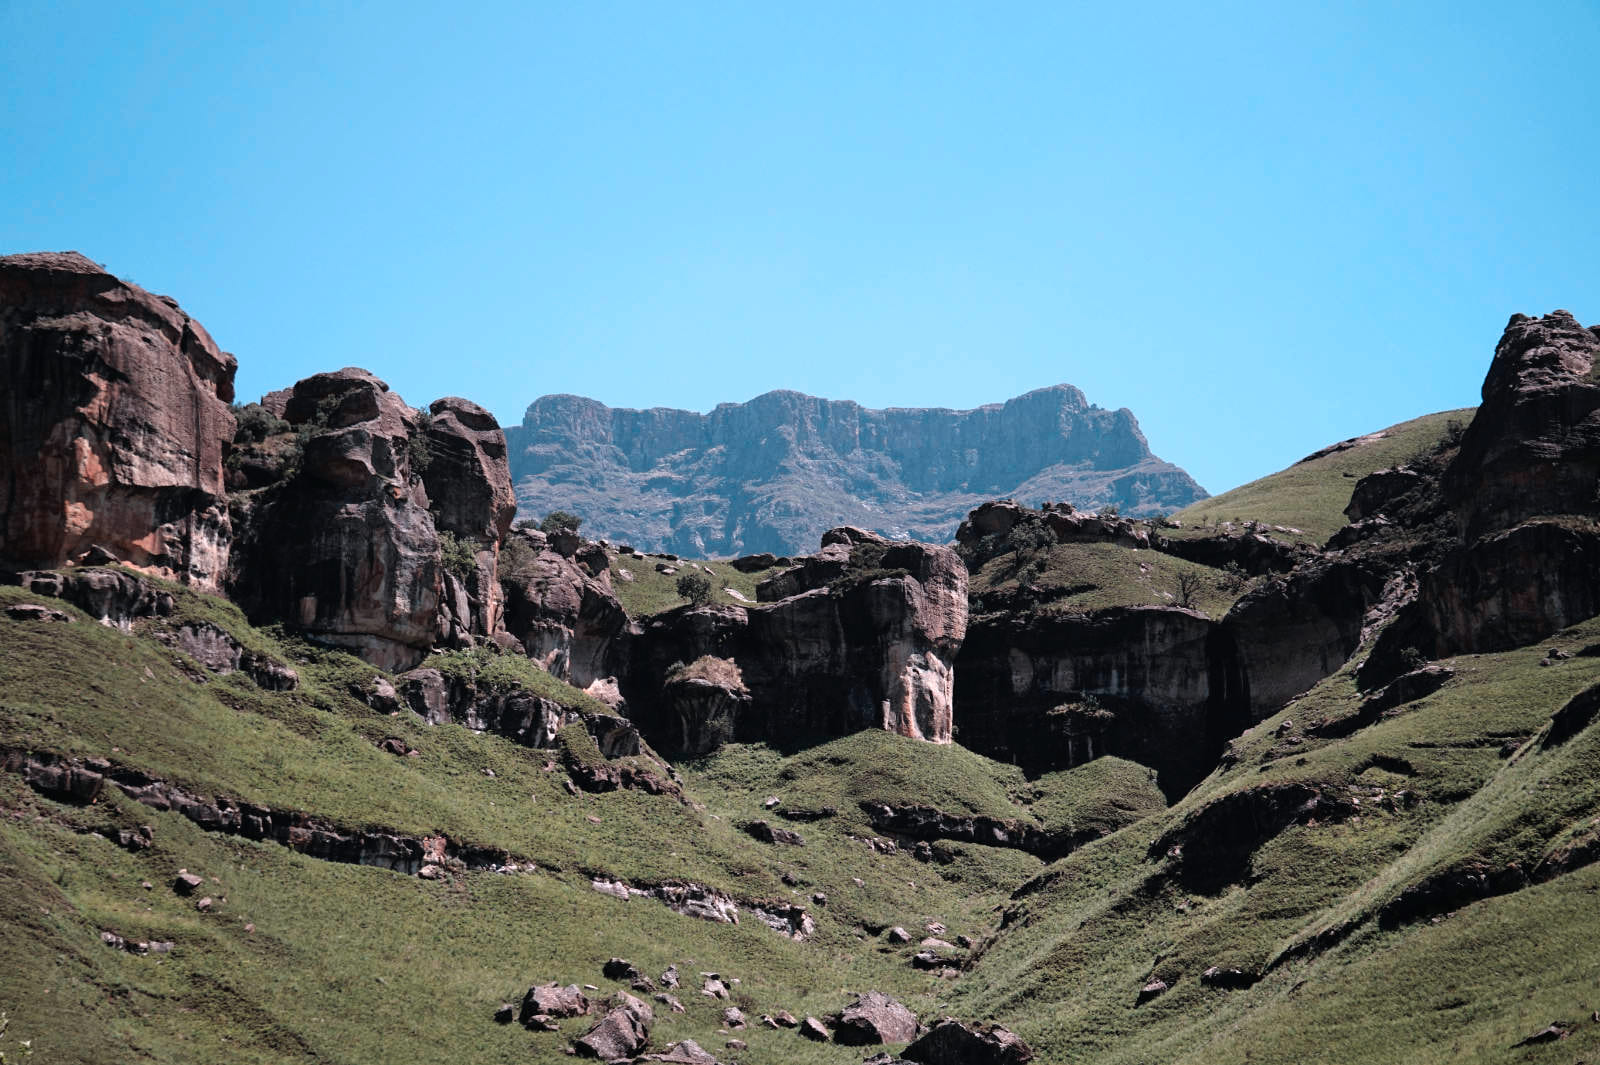 Maloti-Drakensberge